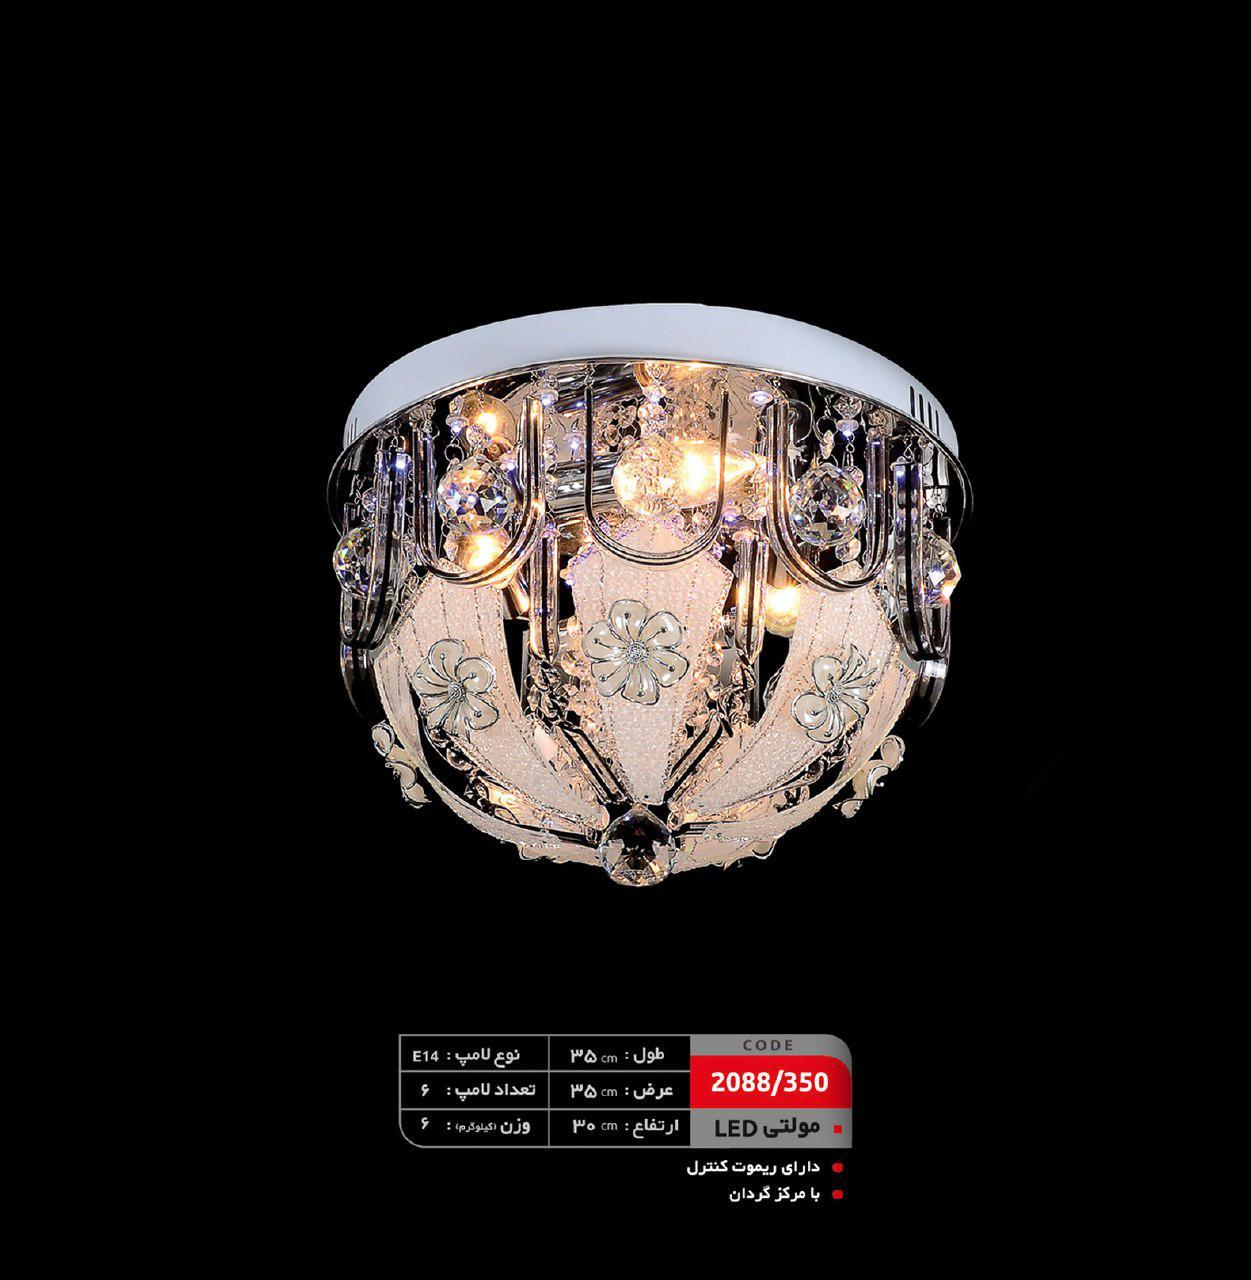 لوستر سقفی مولتی LED (کد: ۳۵۰/ ۲۰۸۸)  